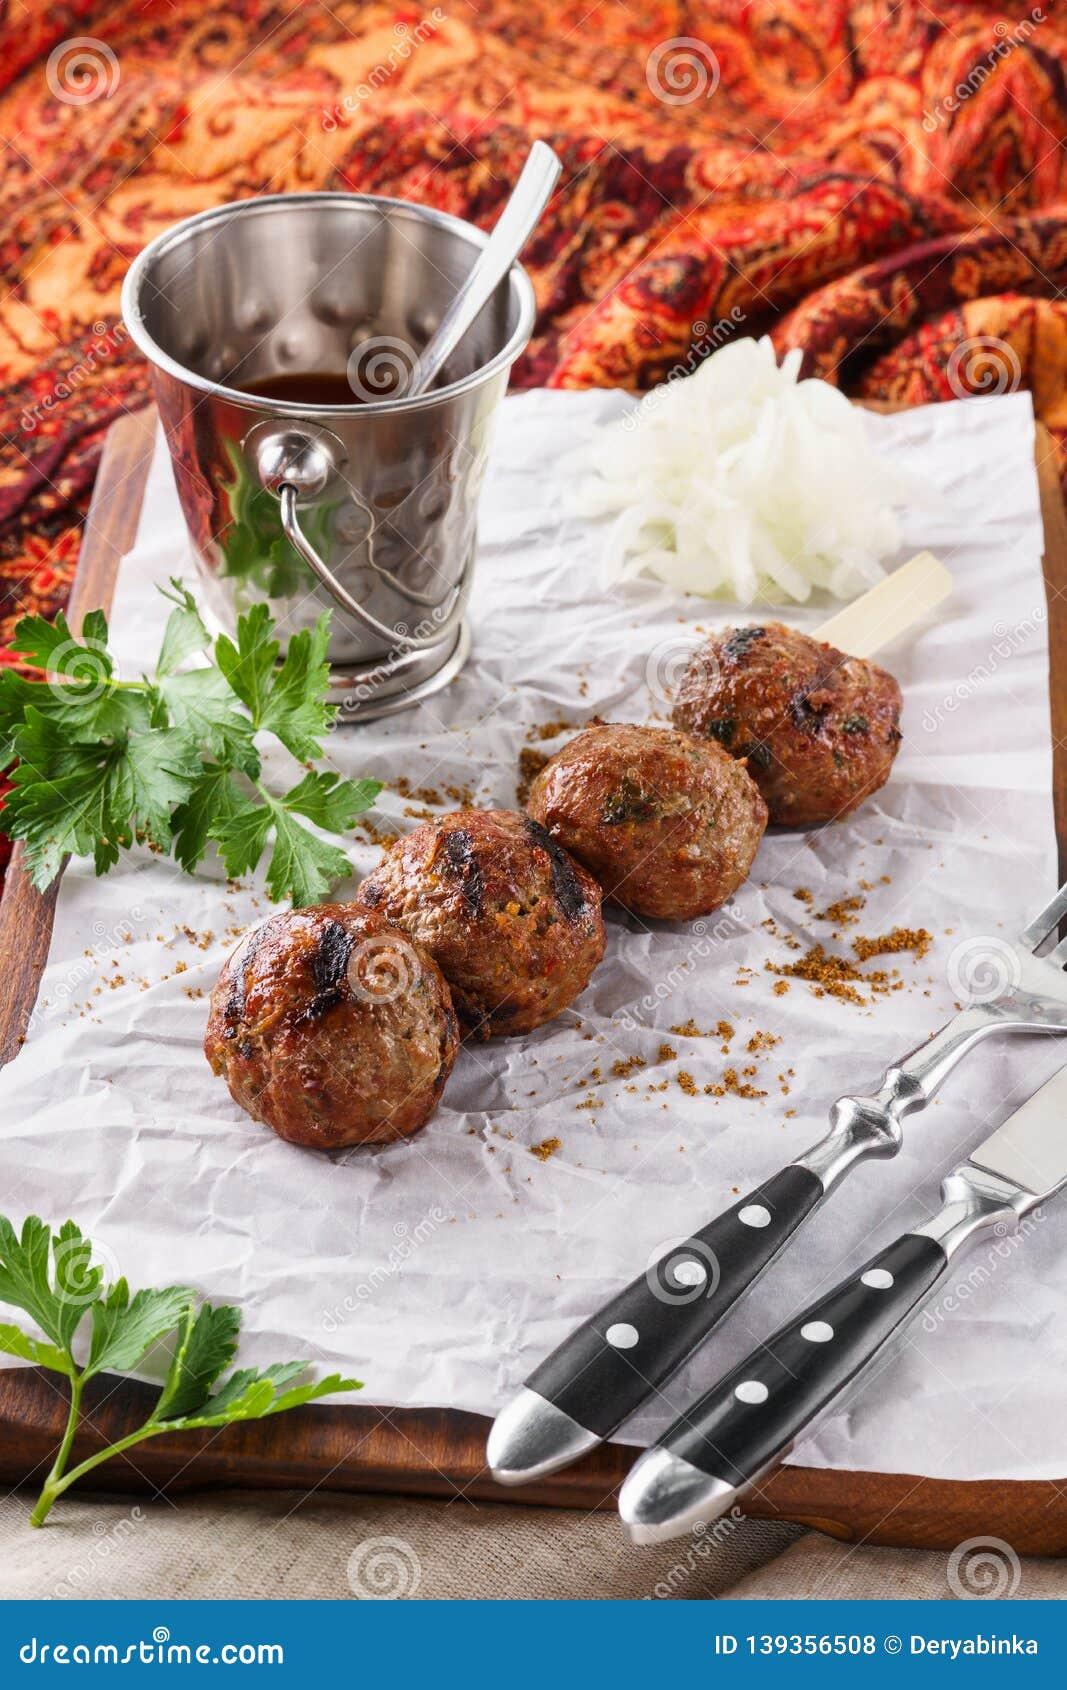 Kebab. Traditional middle eastern, arabic or mediterranean food